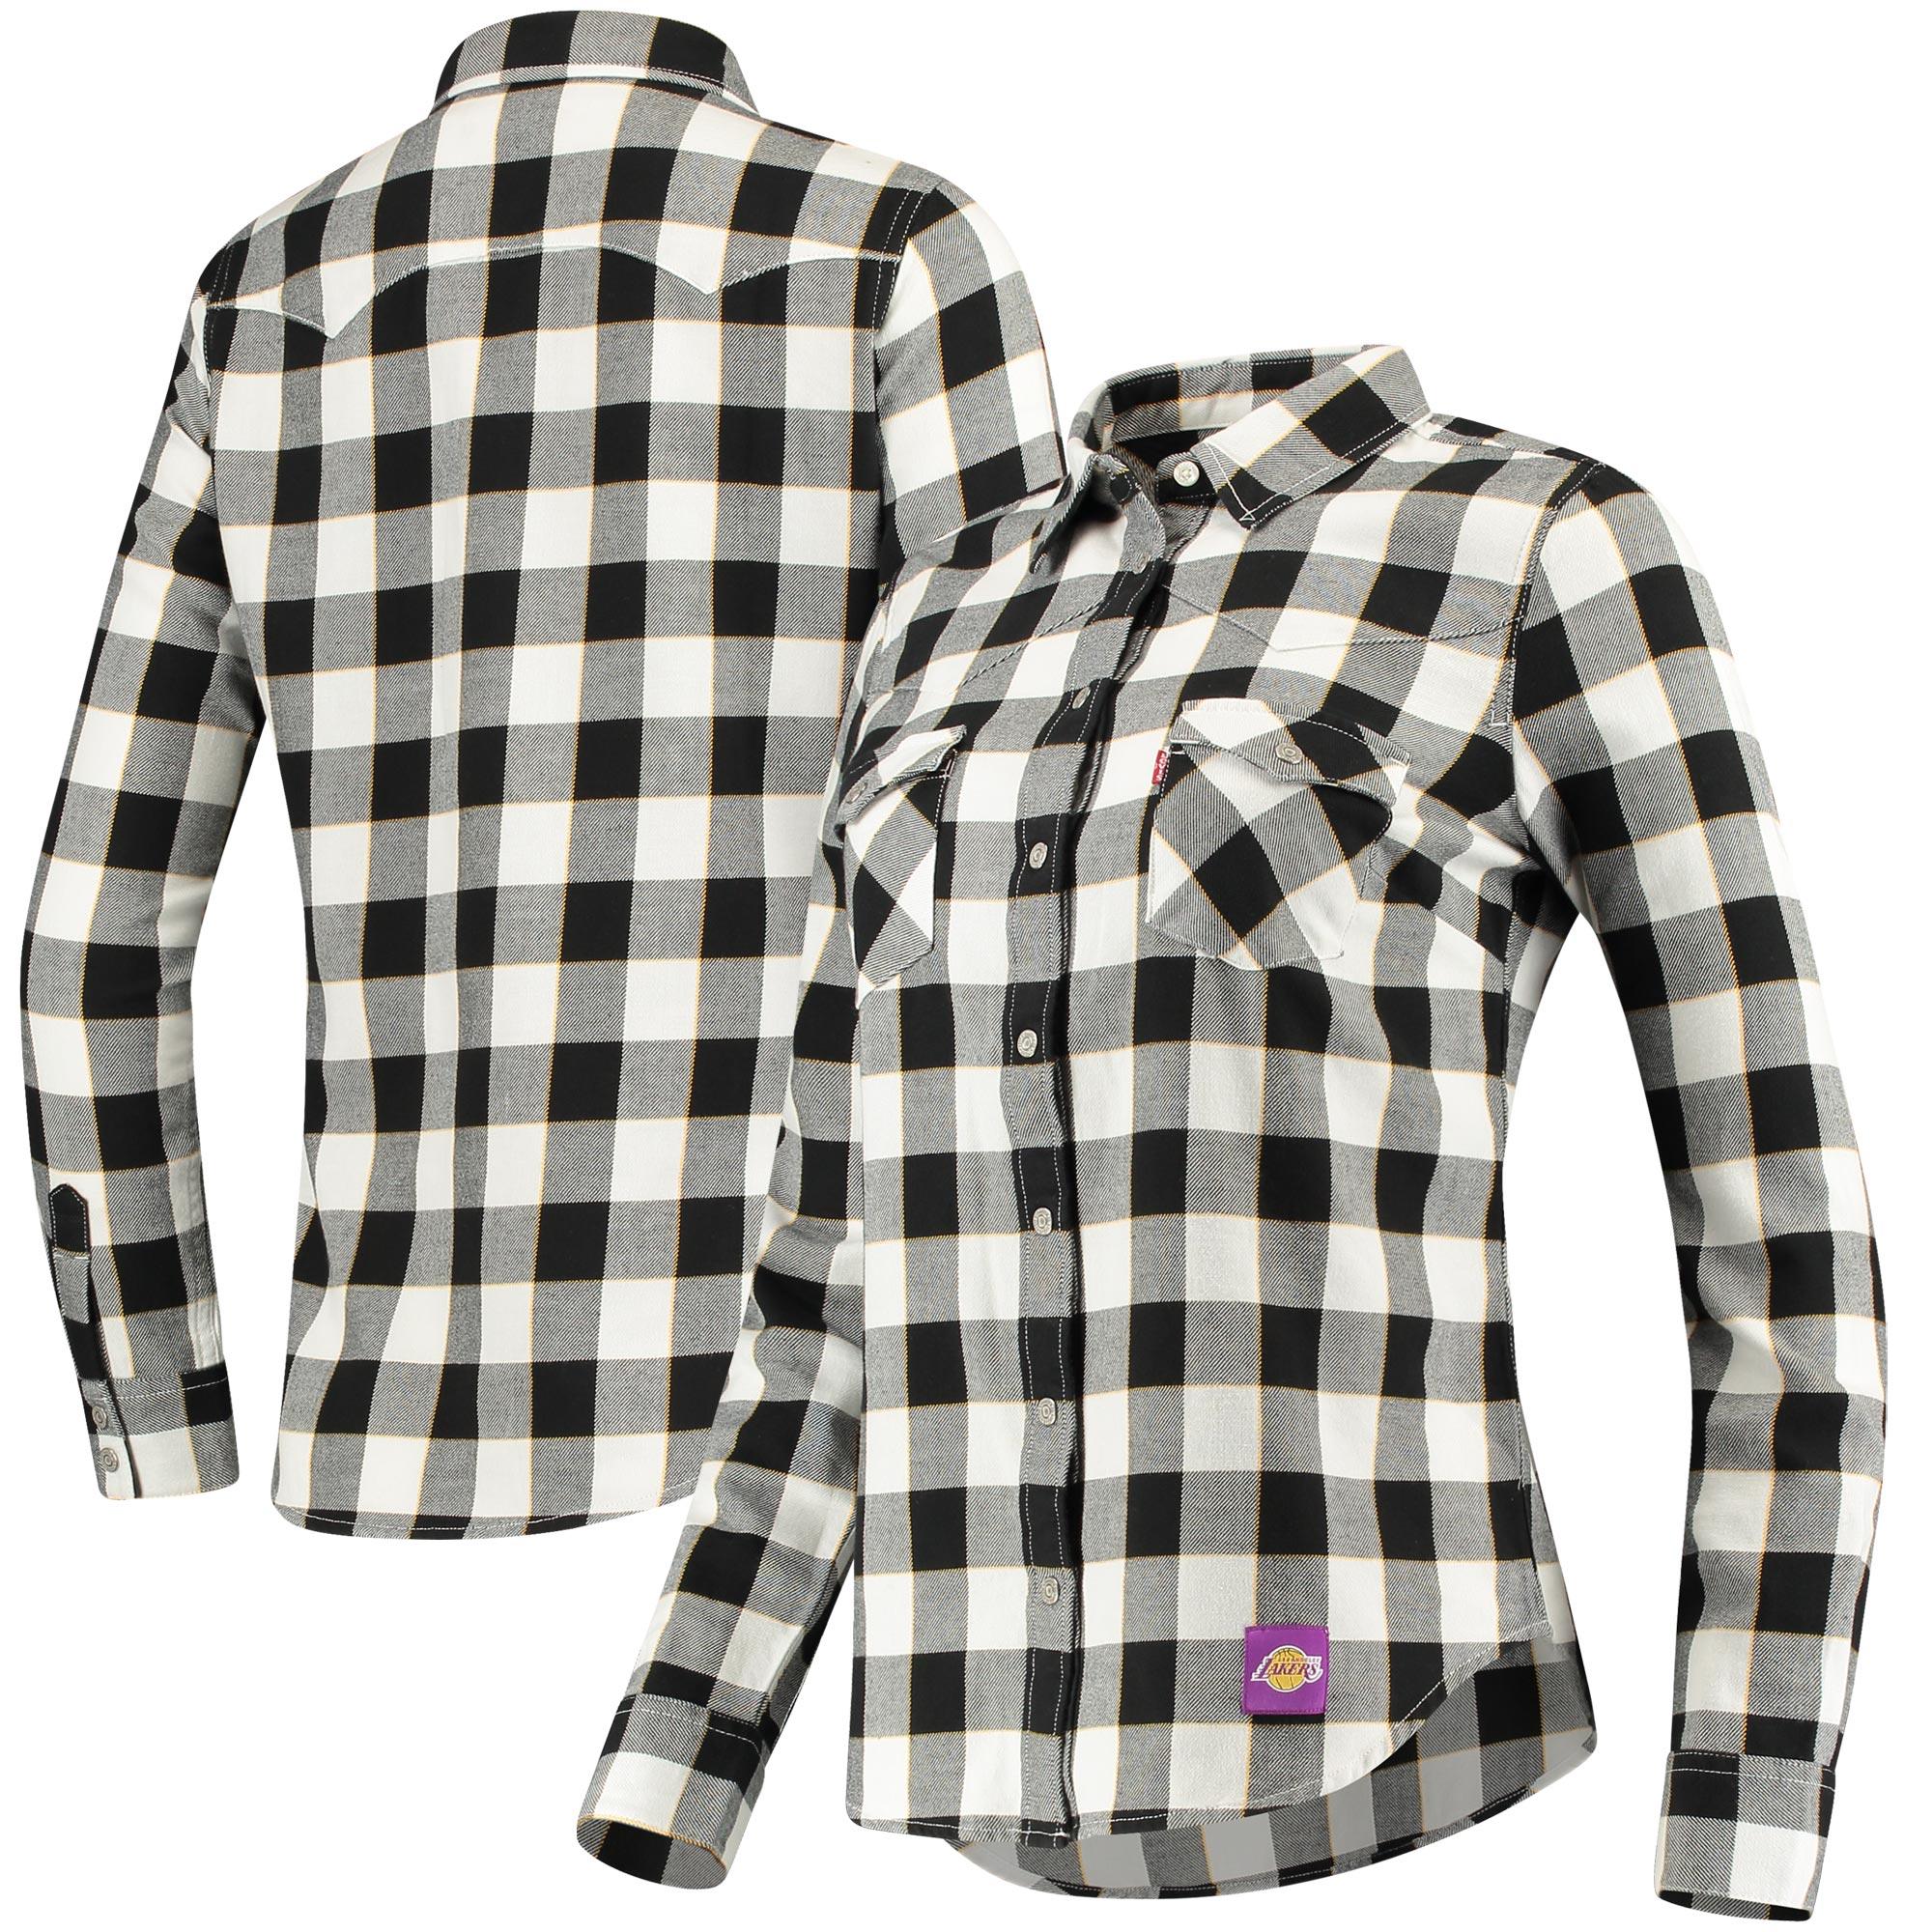 Los Angeles Lakers Levi's Women's Buffalo Western Long Sleeve Button-Up Shirt - Black/White